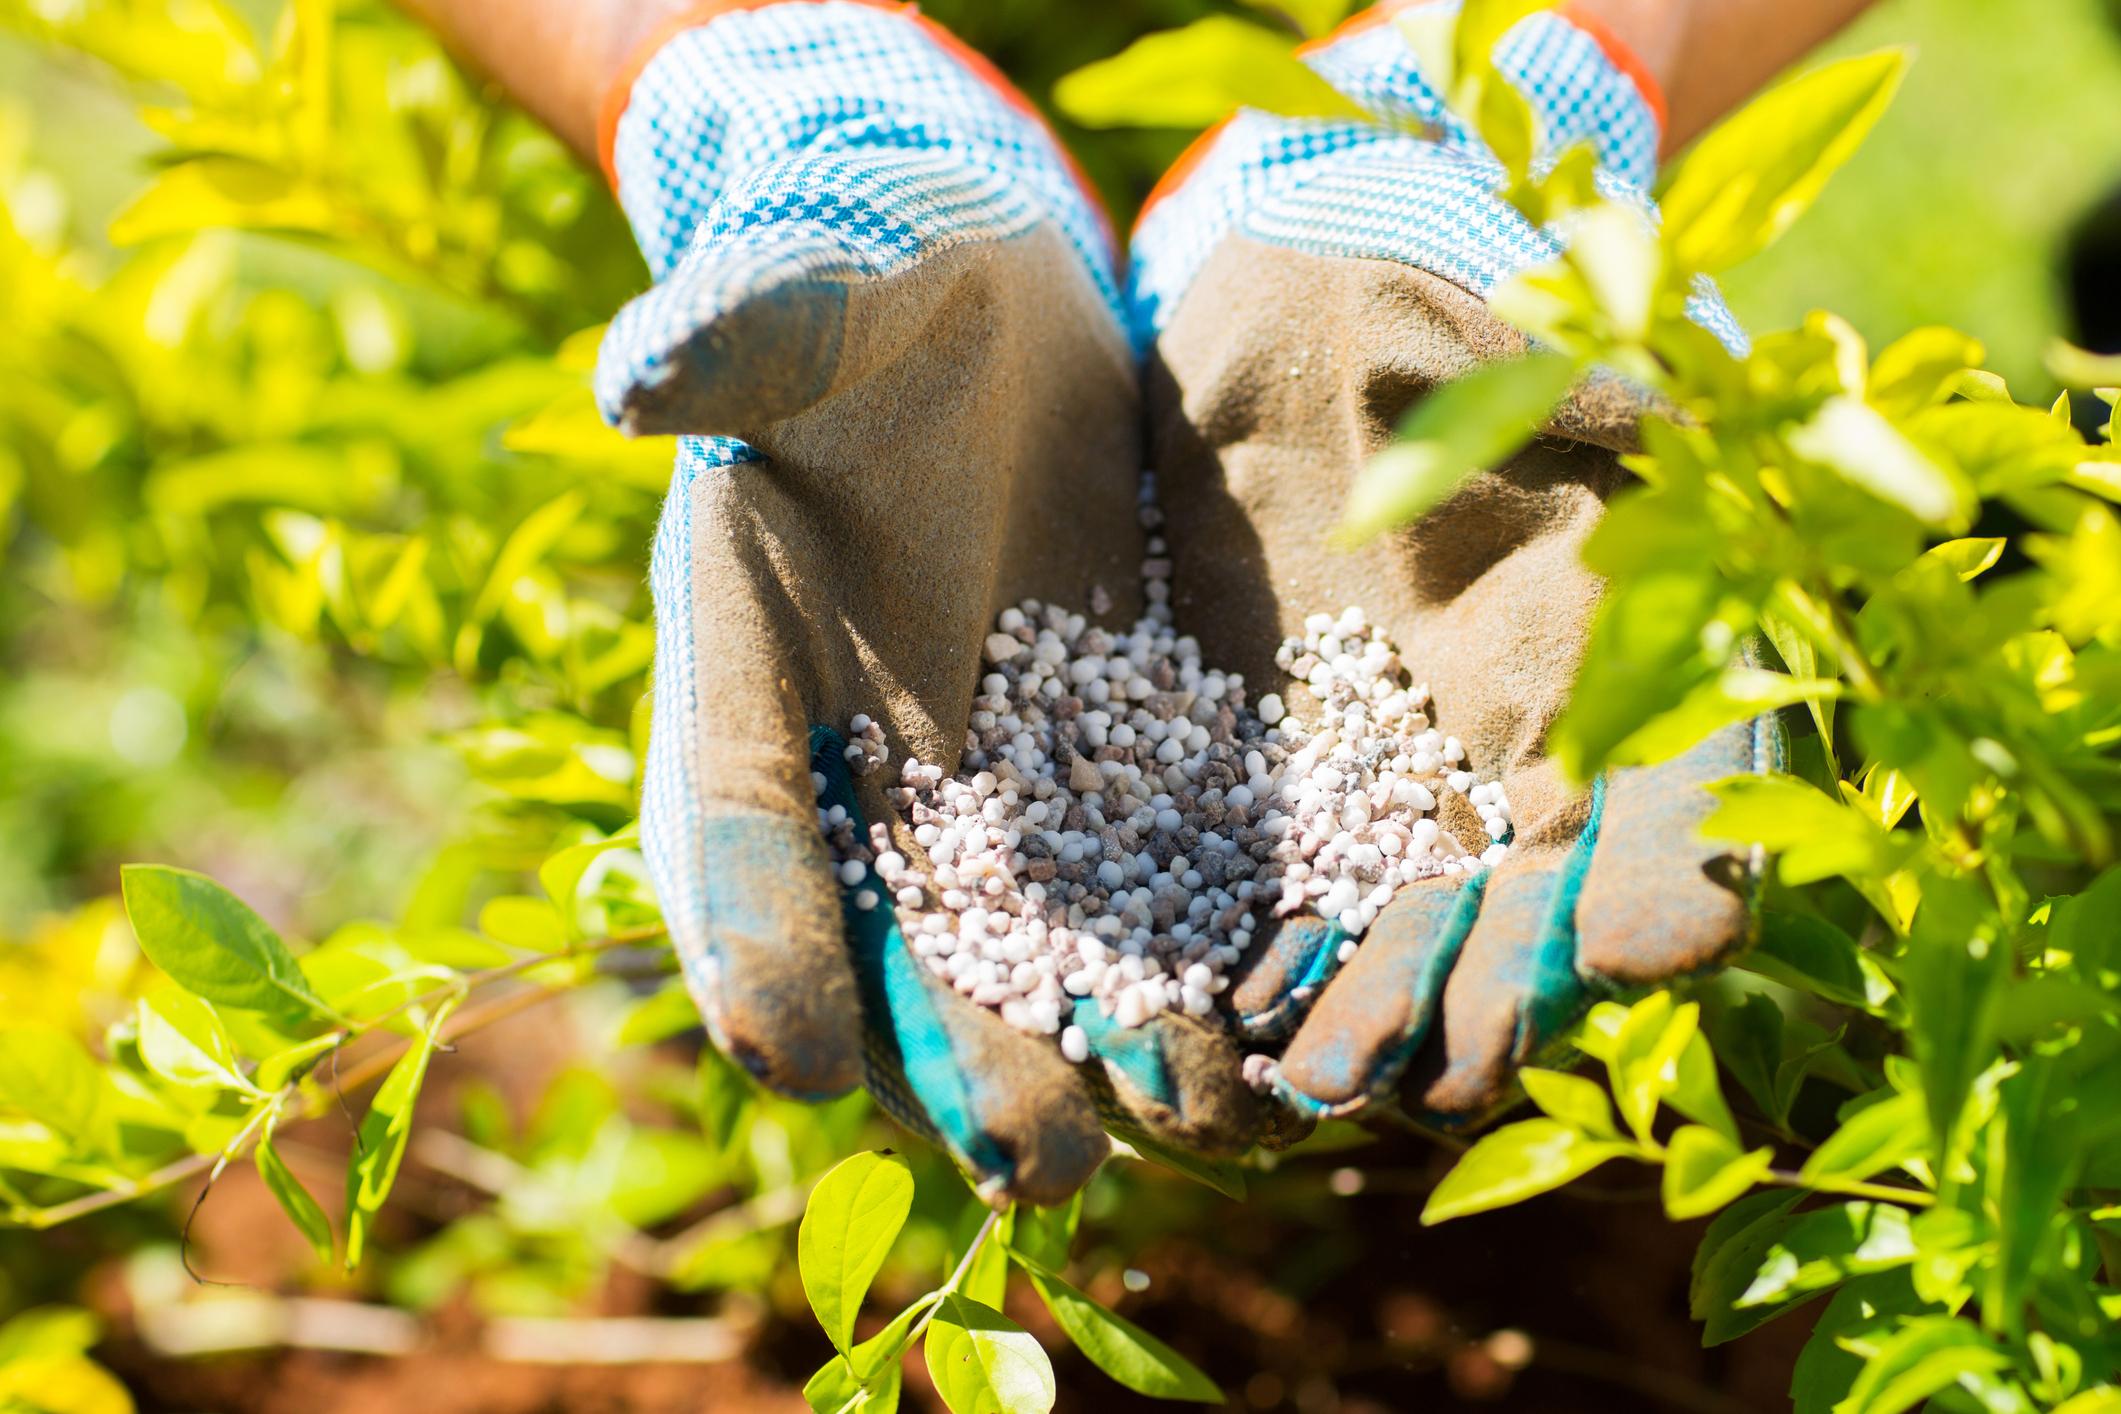 Two gloved hands hold nitrogen fertilizer pellets next to plants.